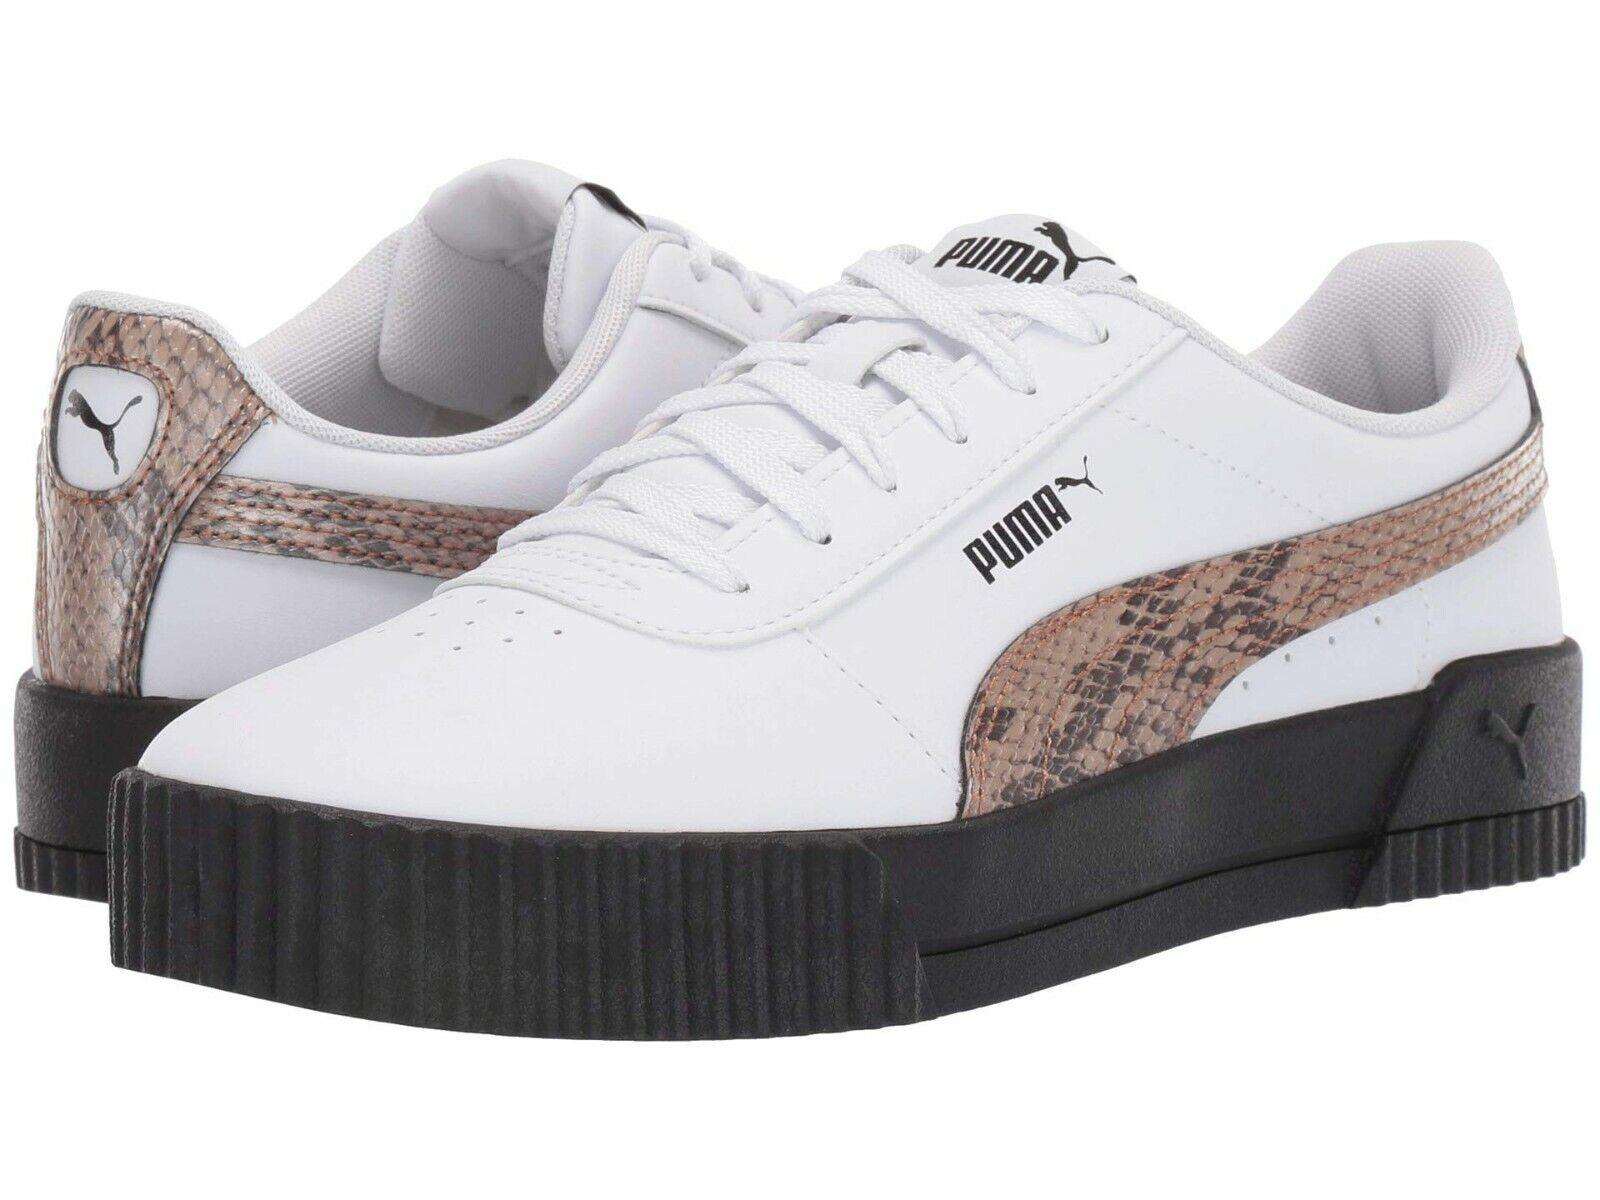 Women's Shoes PUMA CARINA LEO Leather Platform Sneakers 37272201 PUMA WHITE